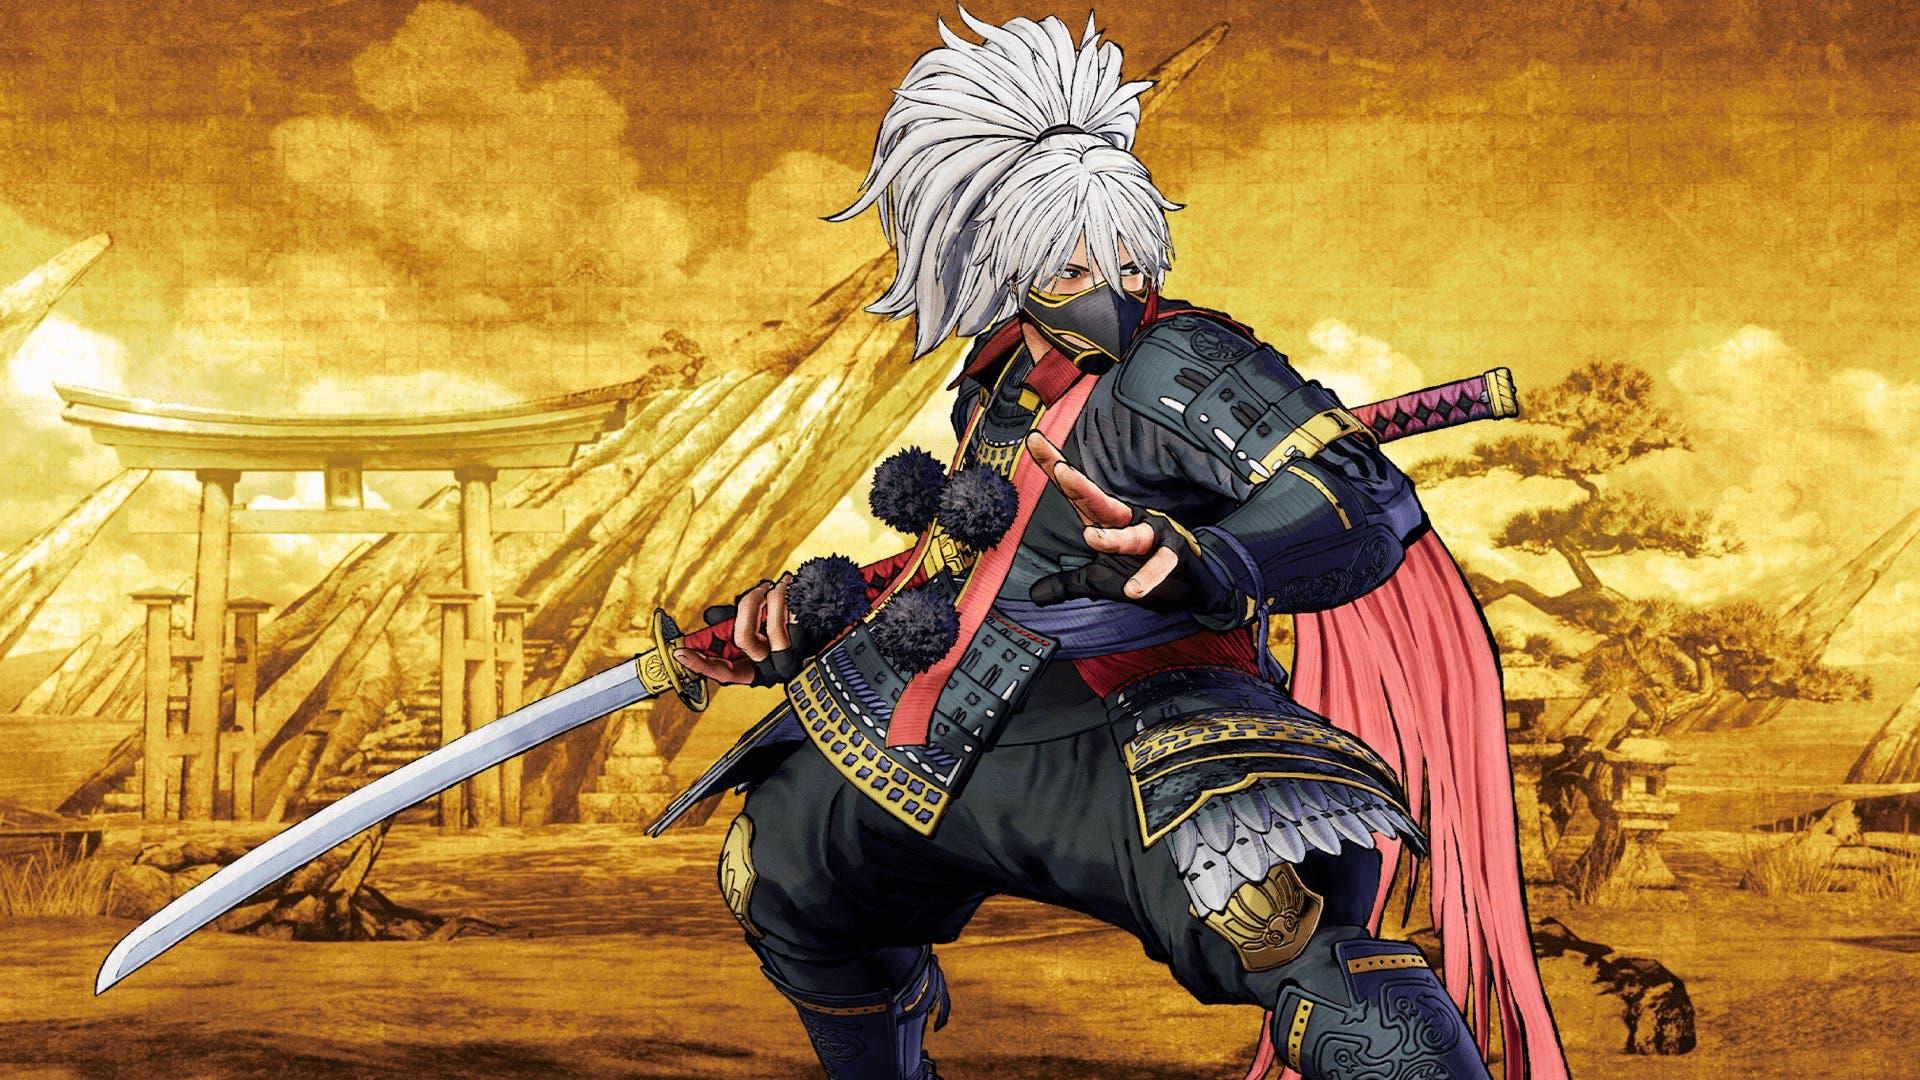 Imagen de Así se ve Samurai Shodown para Nintendo Switch en su primer tráiler